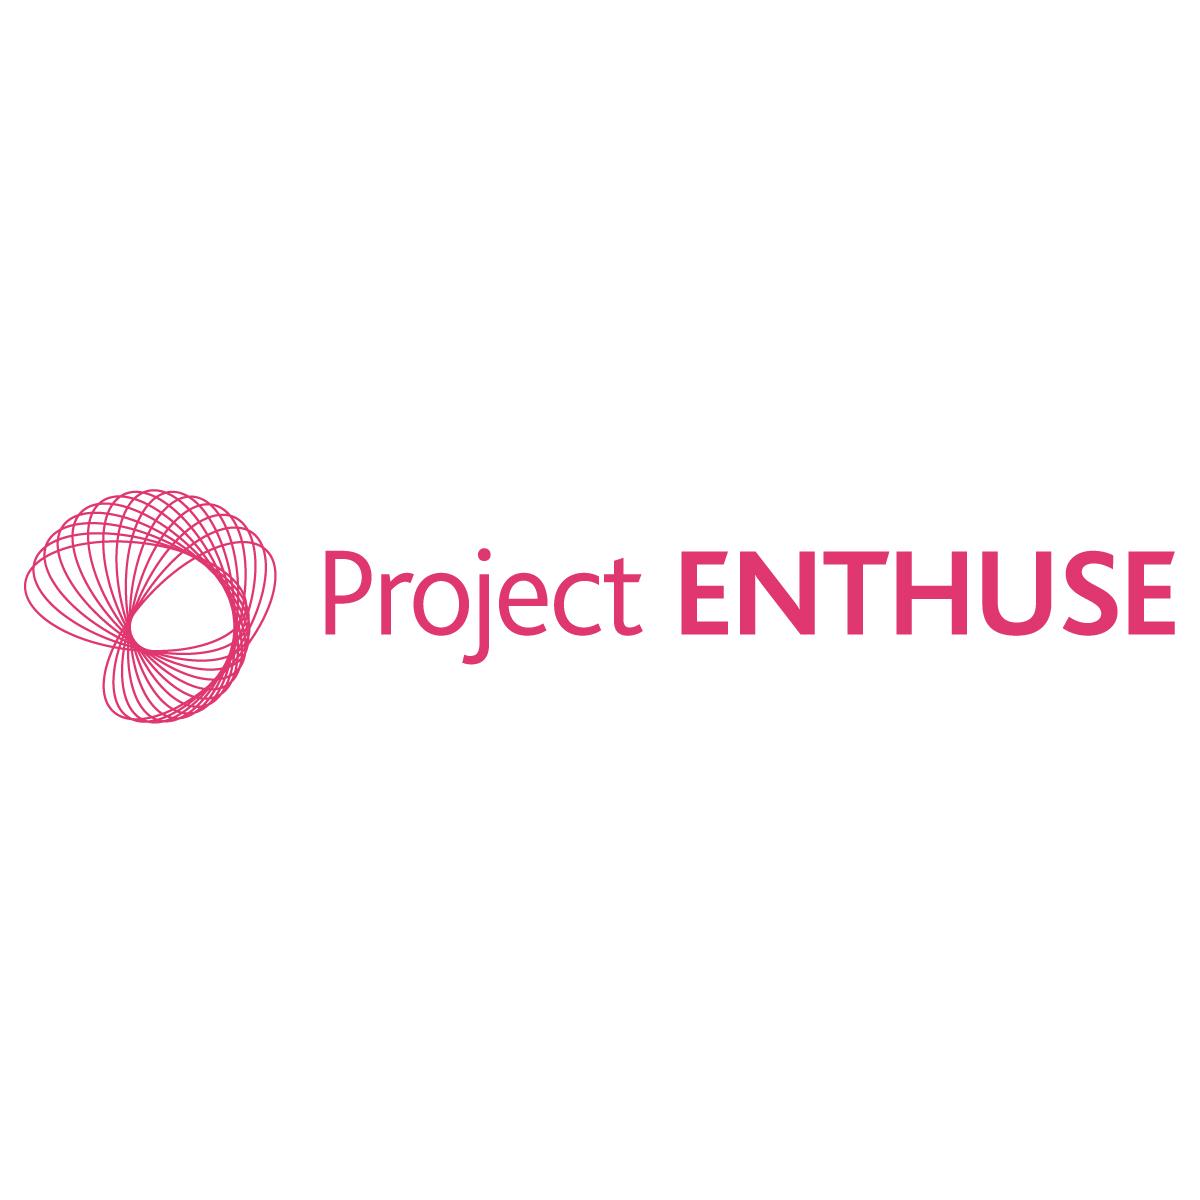 Project Enthuse logo